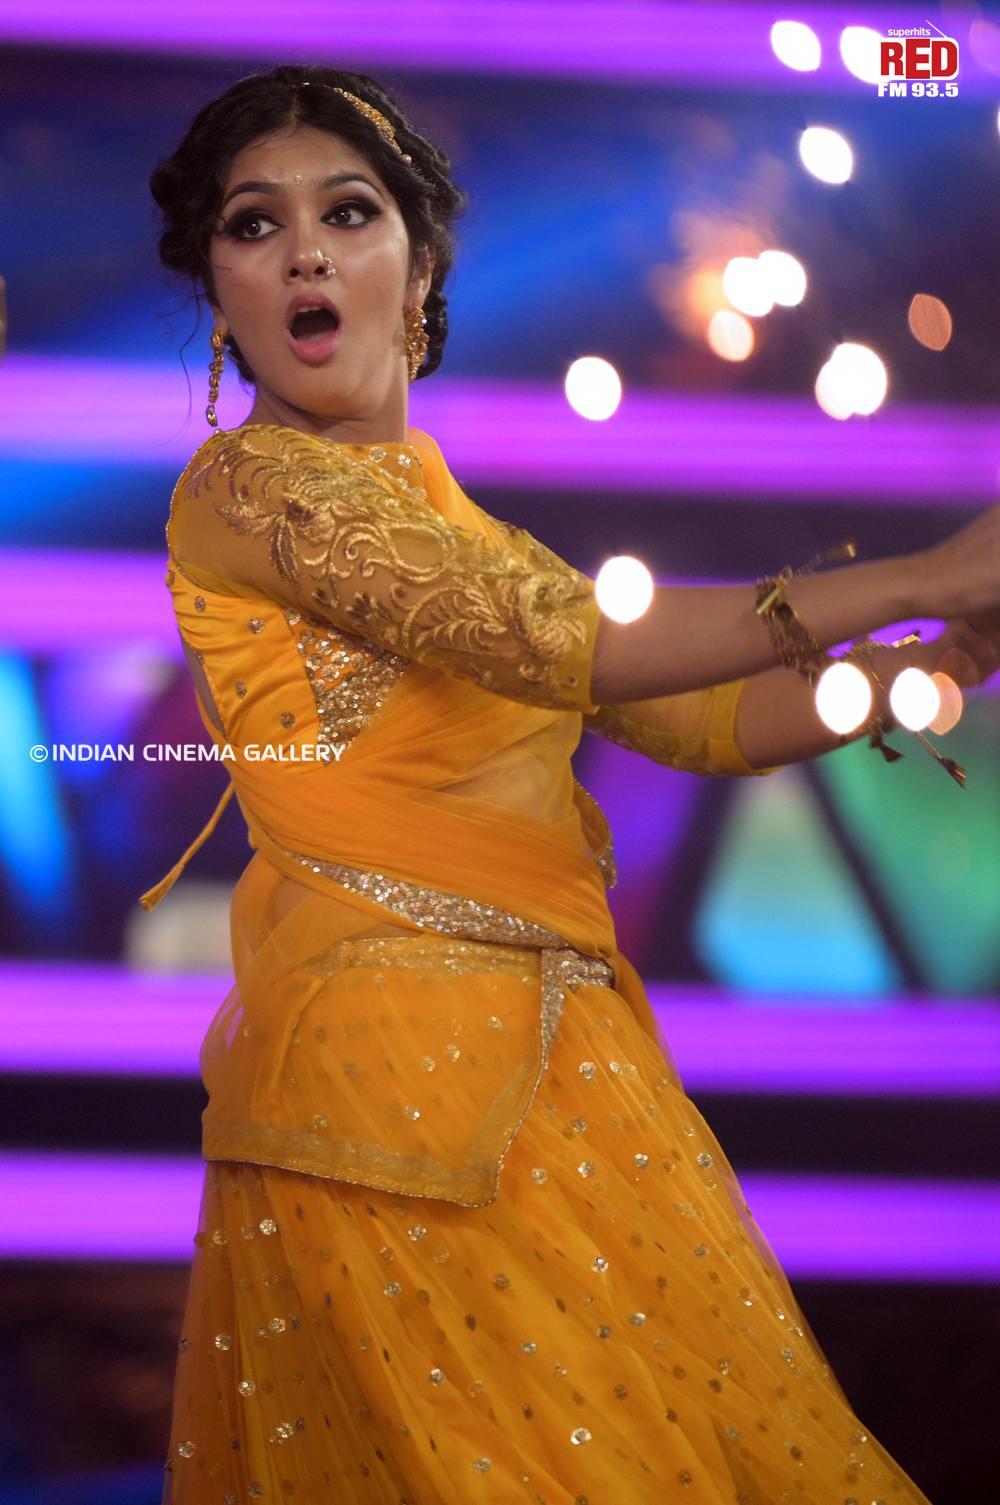 Gayathri Suresh dance at red fm music awards 2019 (29)